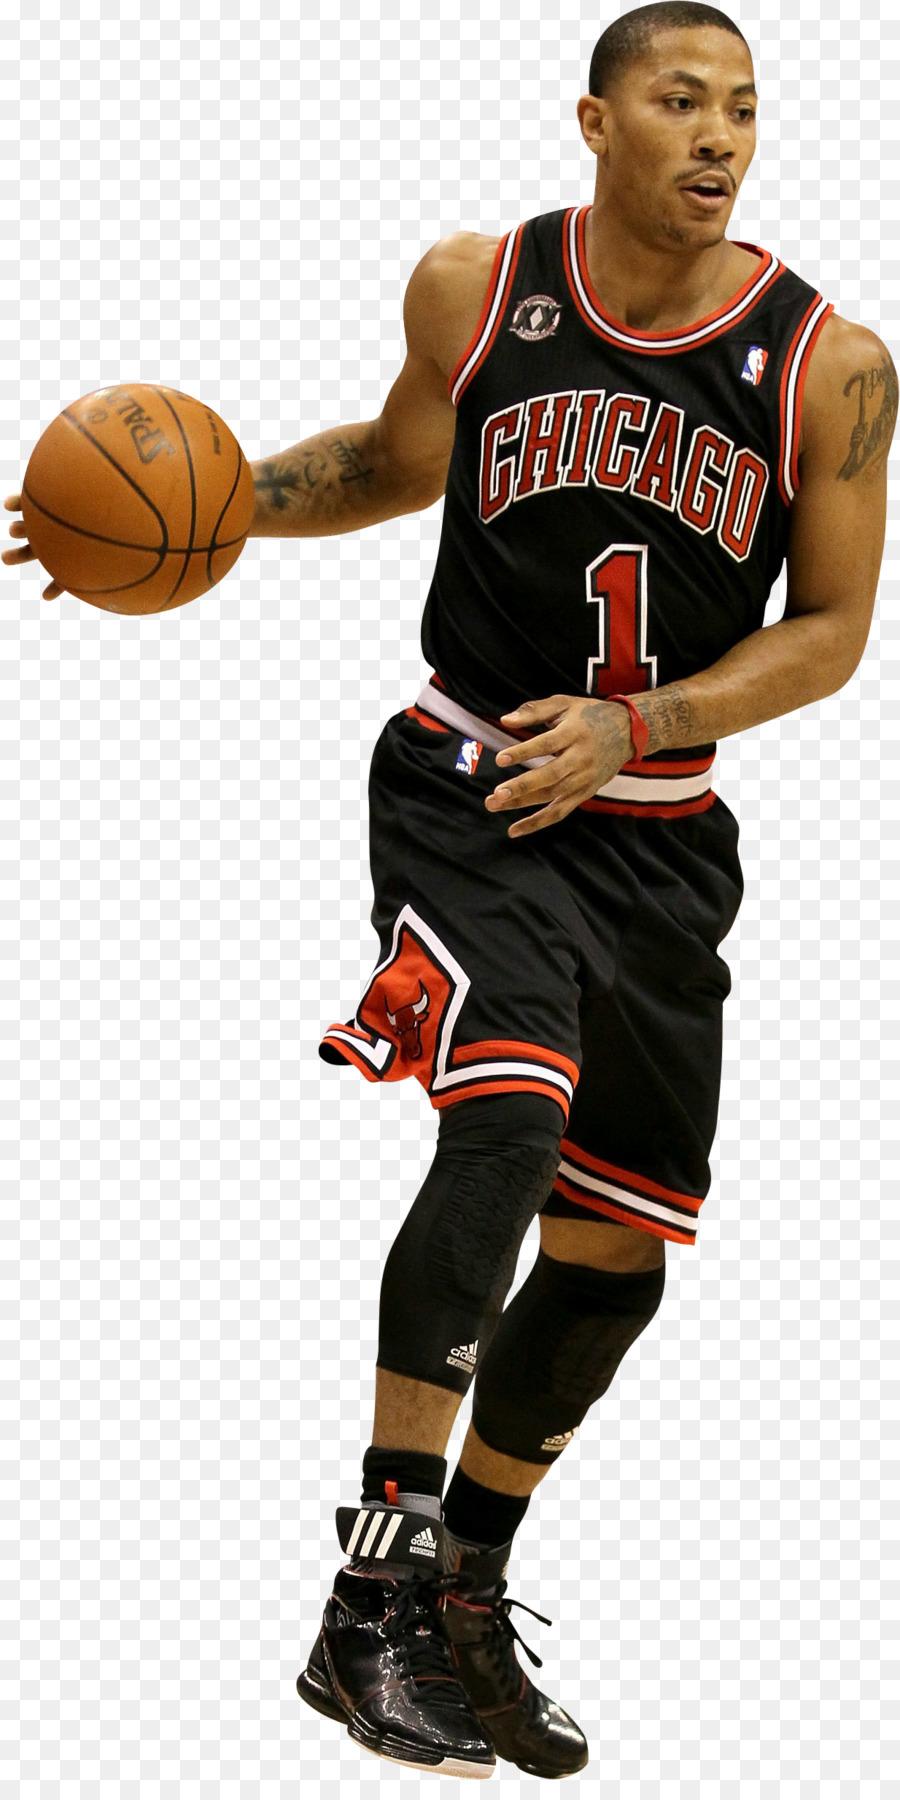 8960d9895ef2 Derrick Rose Chicago Bulls NBA Playoffs NBA 2K16 - nba png download -  1234 2441 - Free Transparent Derrick Rose png Download.